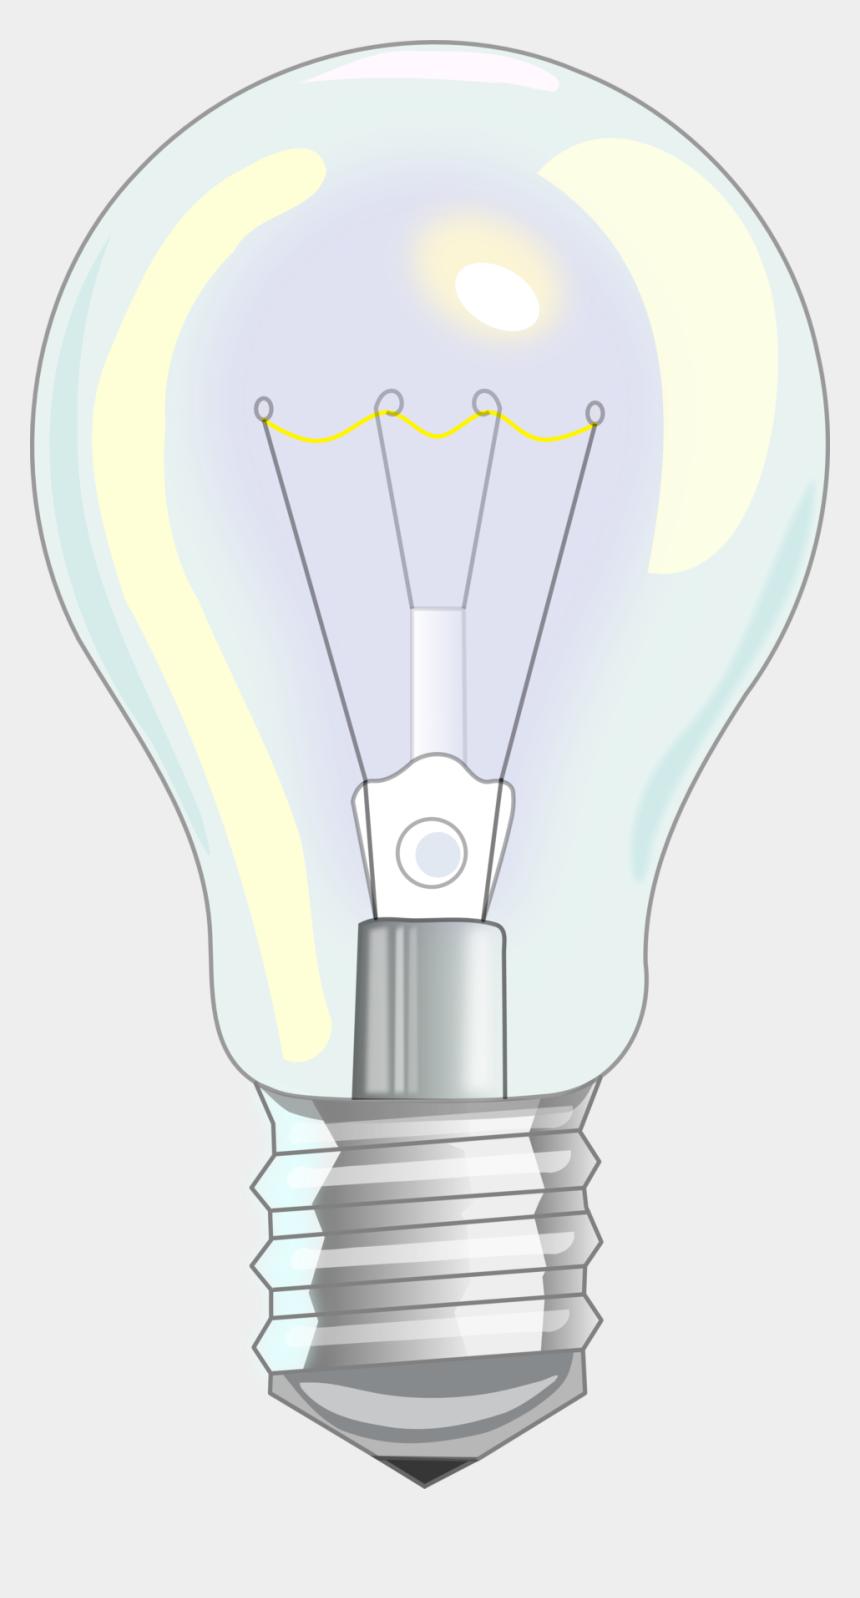 edison bulb clipart, Cartoons - Incandescent Light Bulb Lamp Incandescence Electric - Bulbon And Bulboff Gif